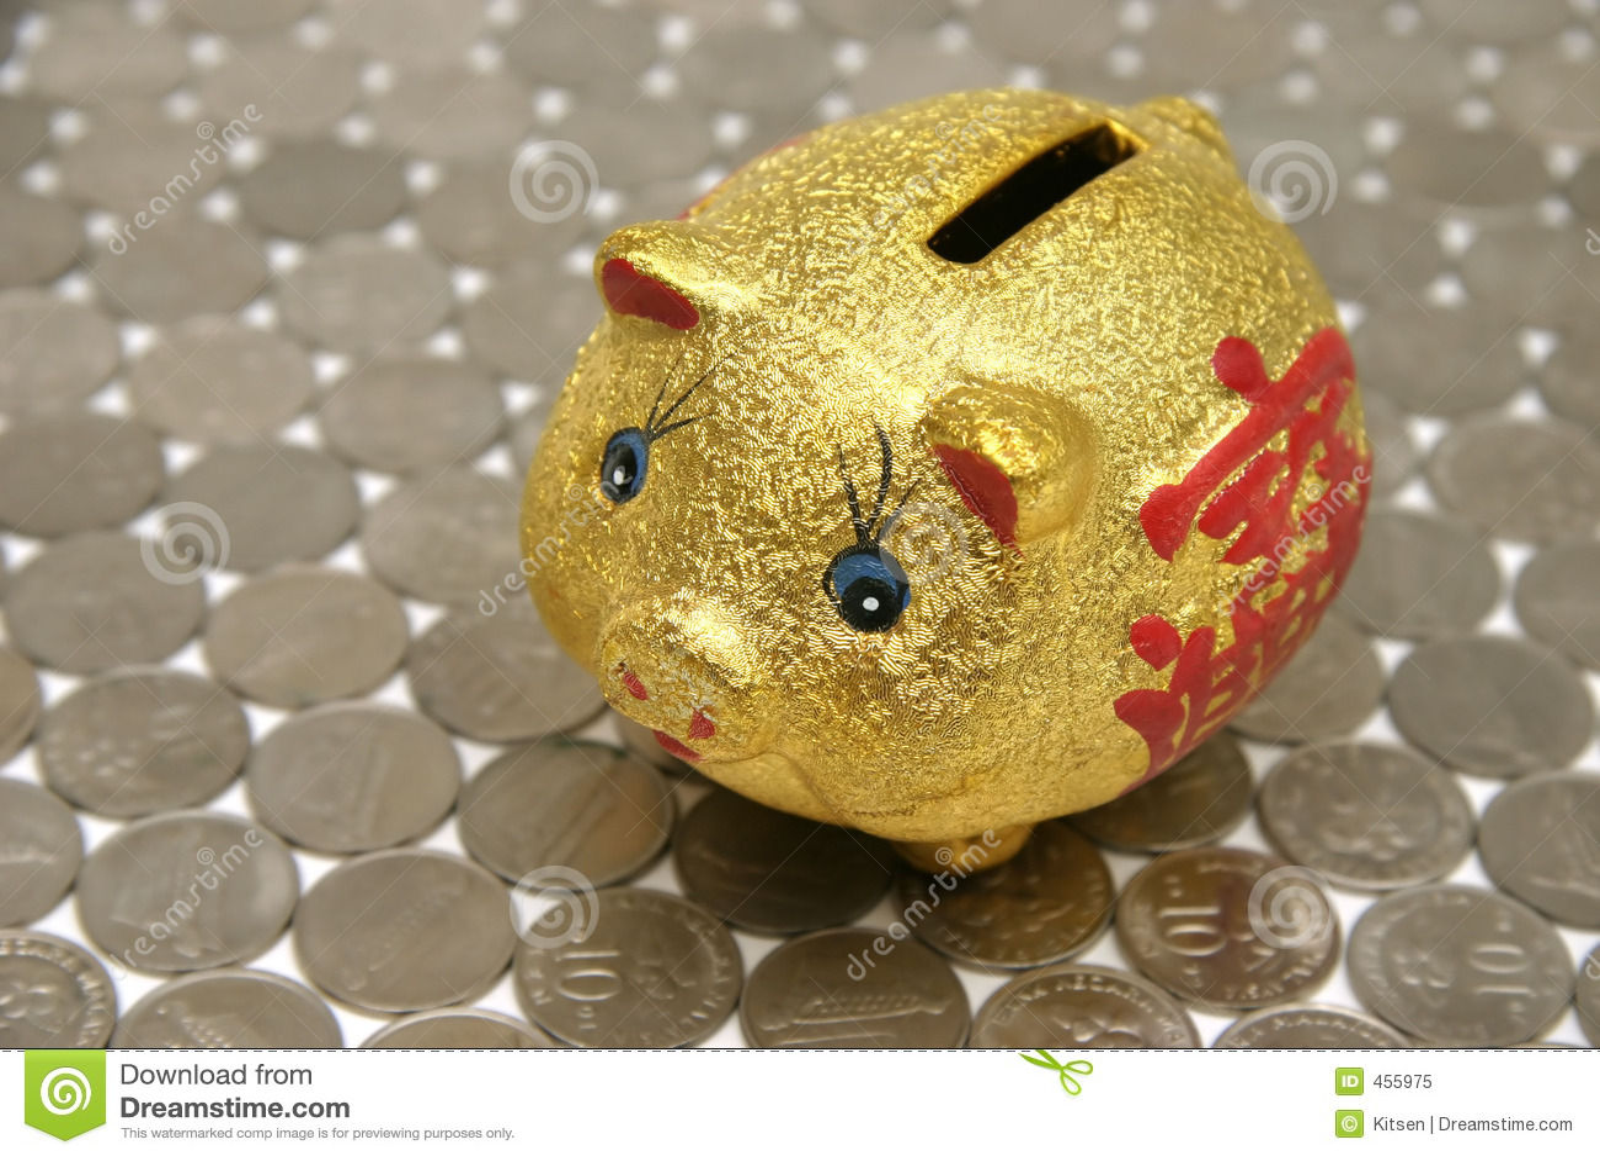 Download Piggybank stock image. Image of foil, cute, power, splayed - 455975